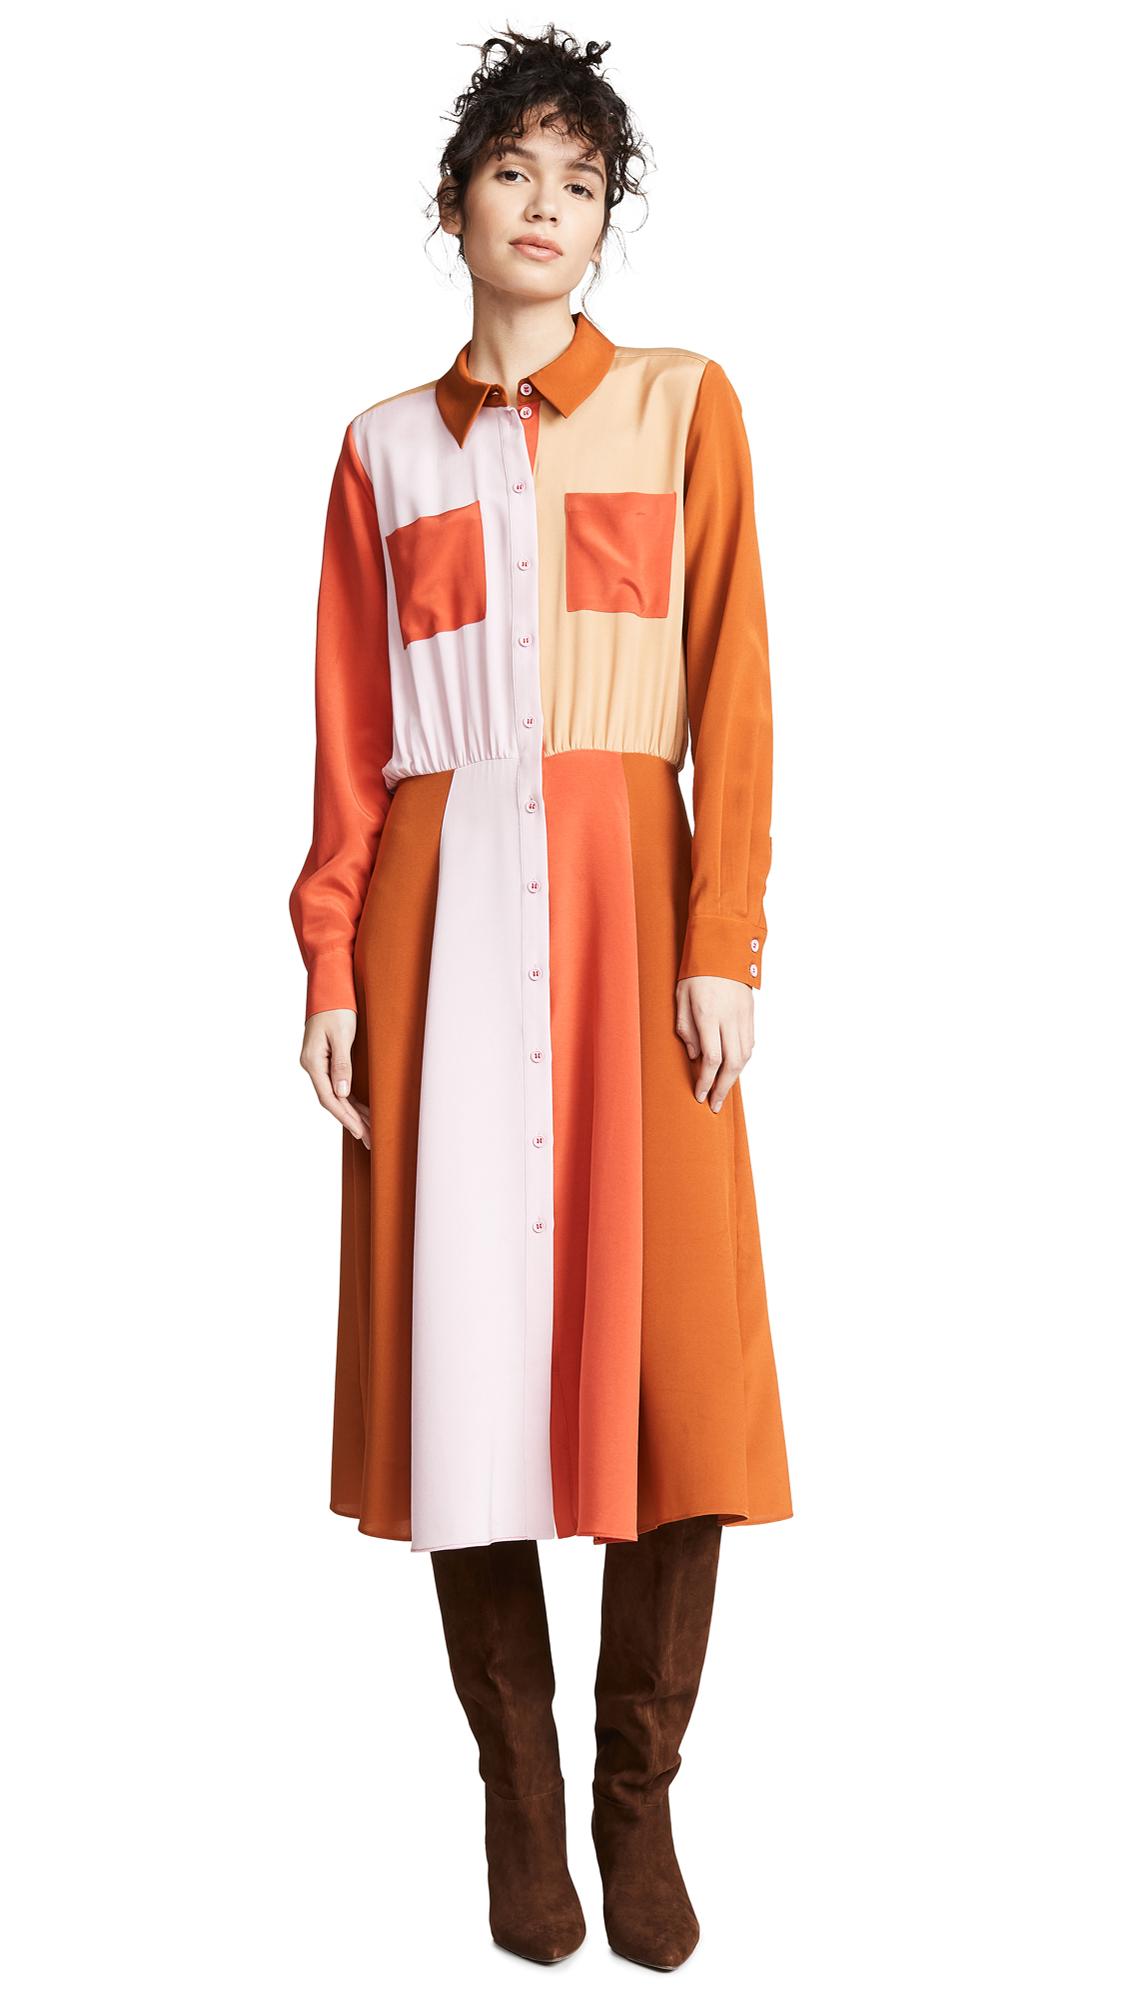 Stine Goya Renee Dress - Color Mix